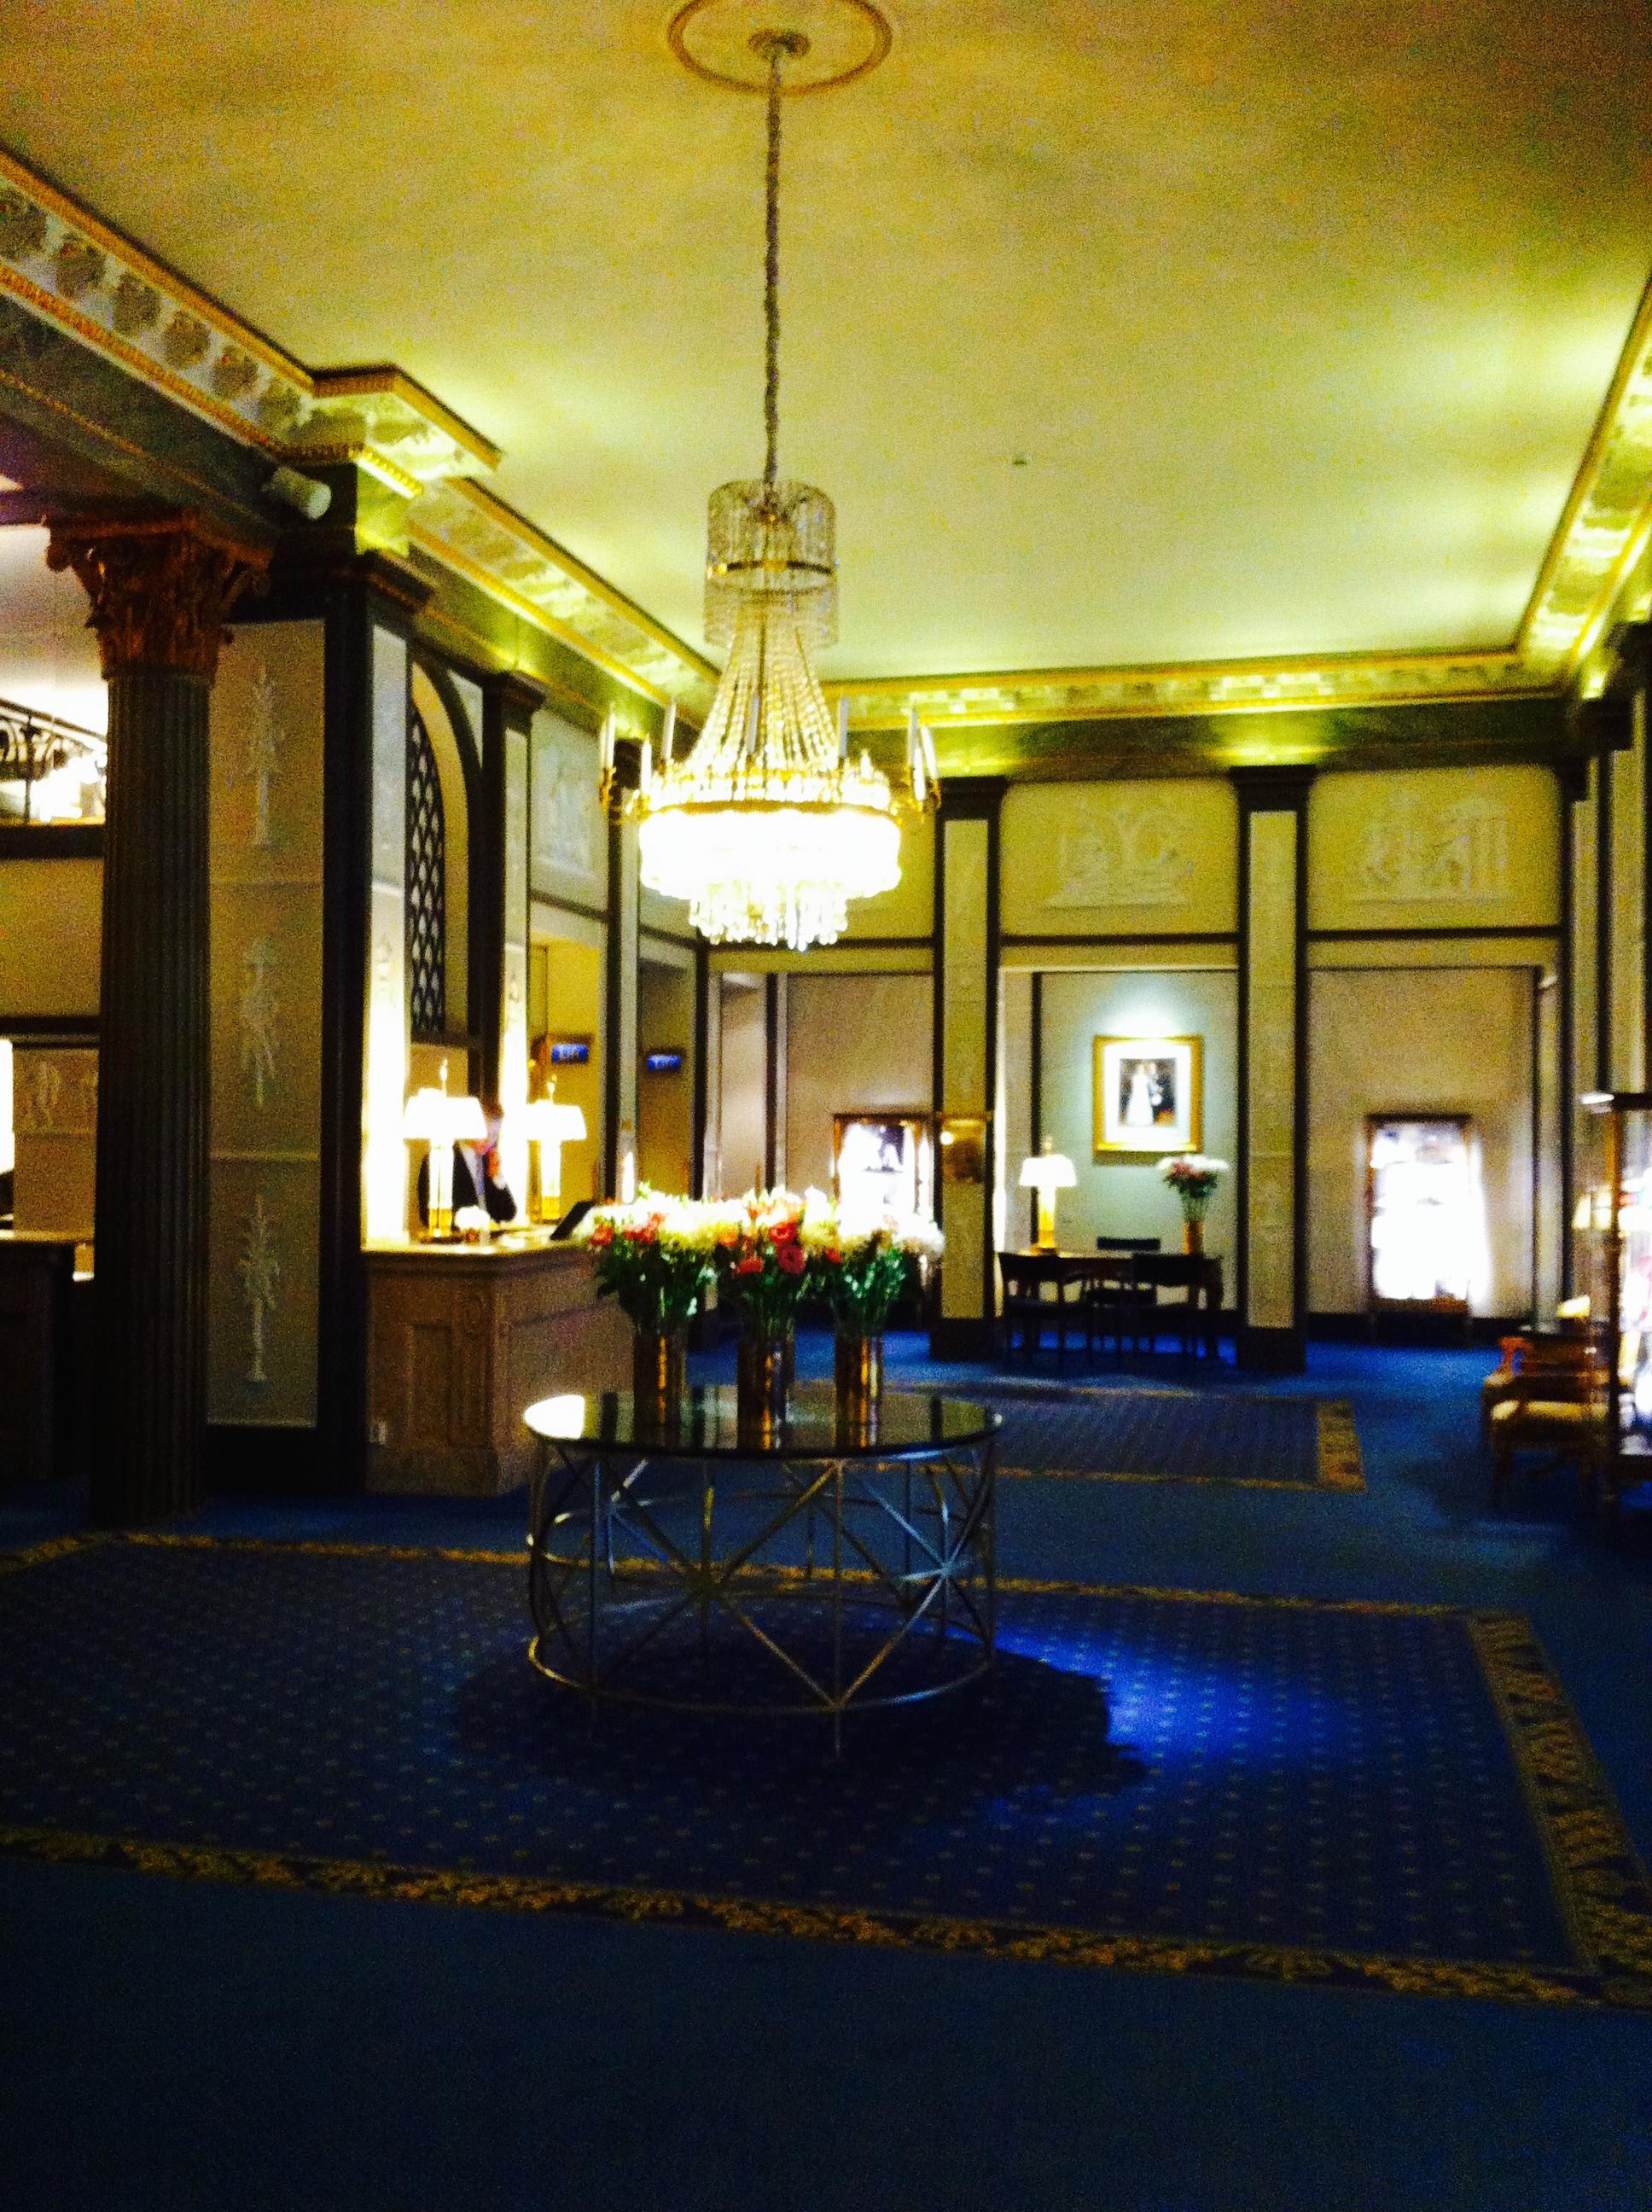 Grand hotel stockholm sweden 5 star classy style for Hotel stockholm